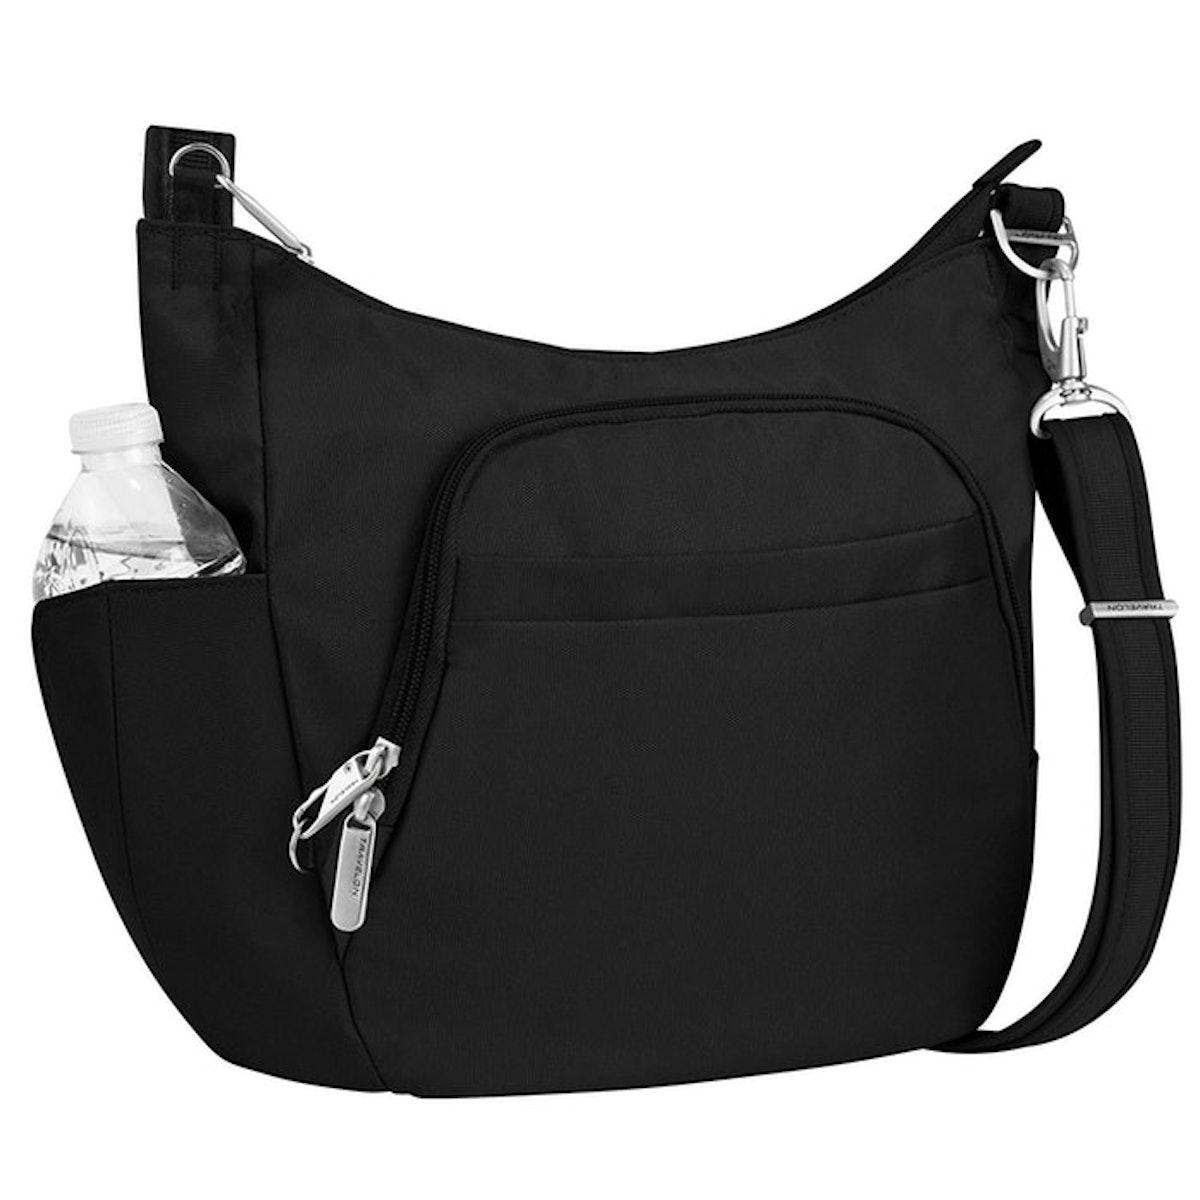 Travelon Anti-Theft Cross-Body Bucket Bag